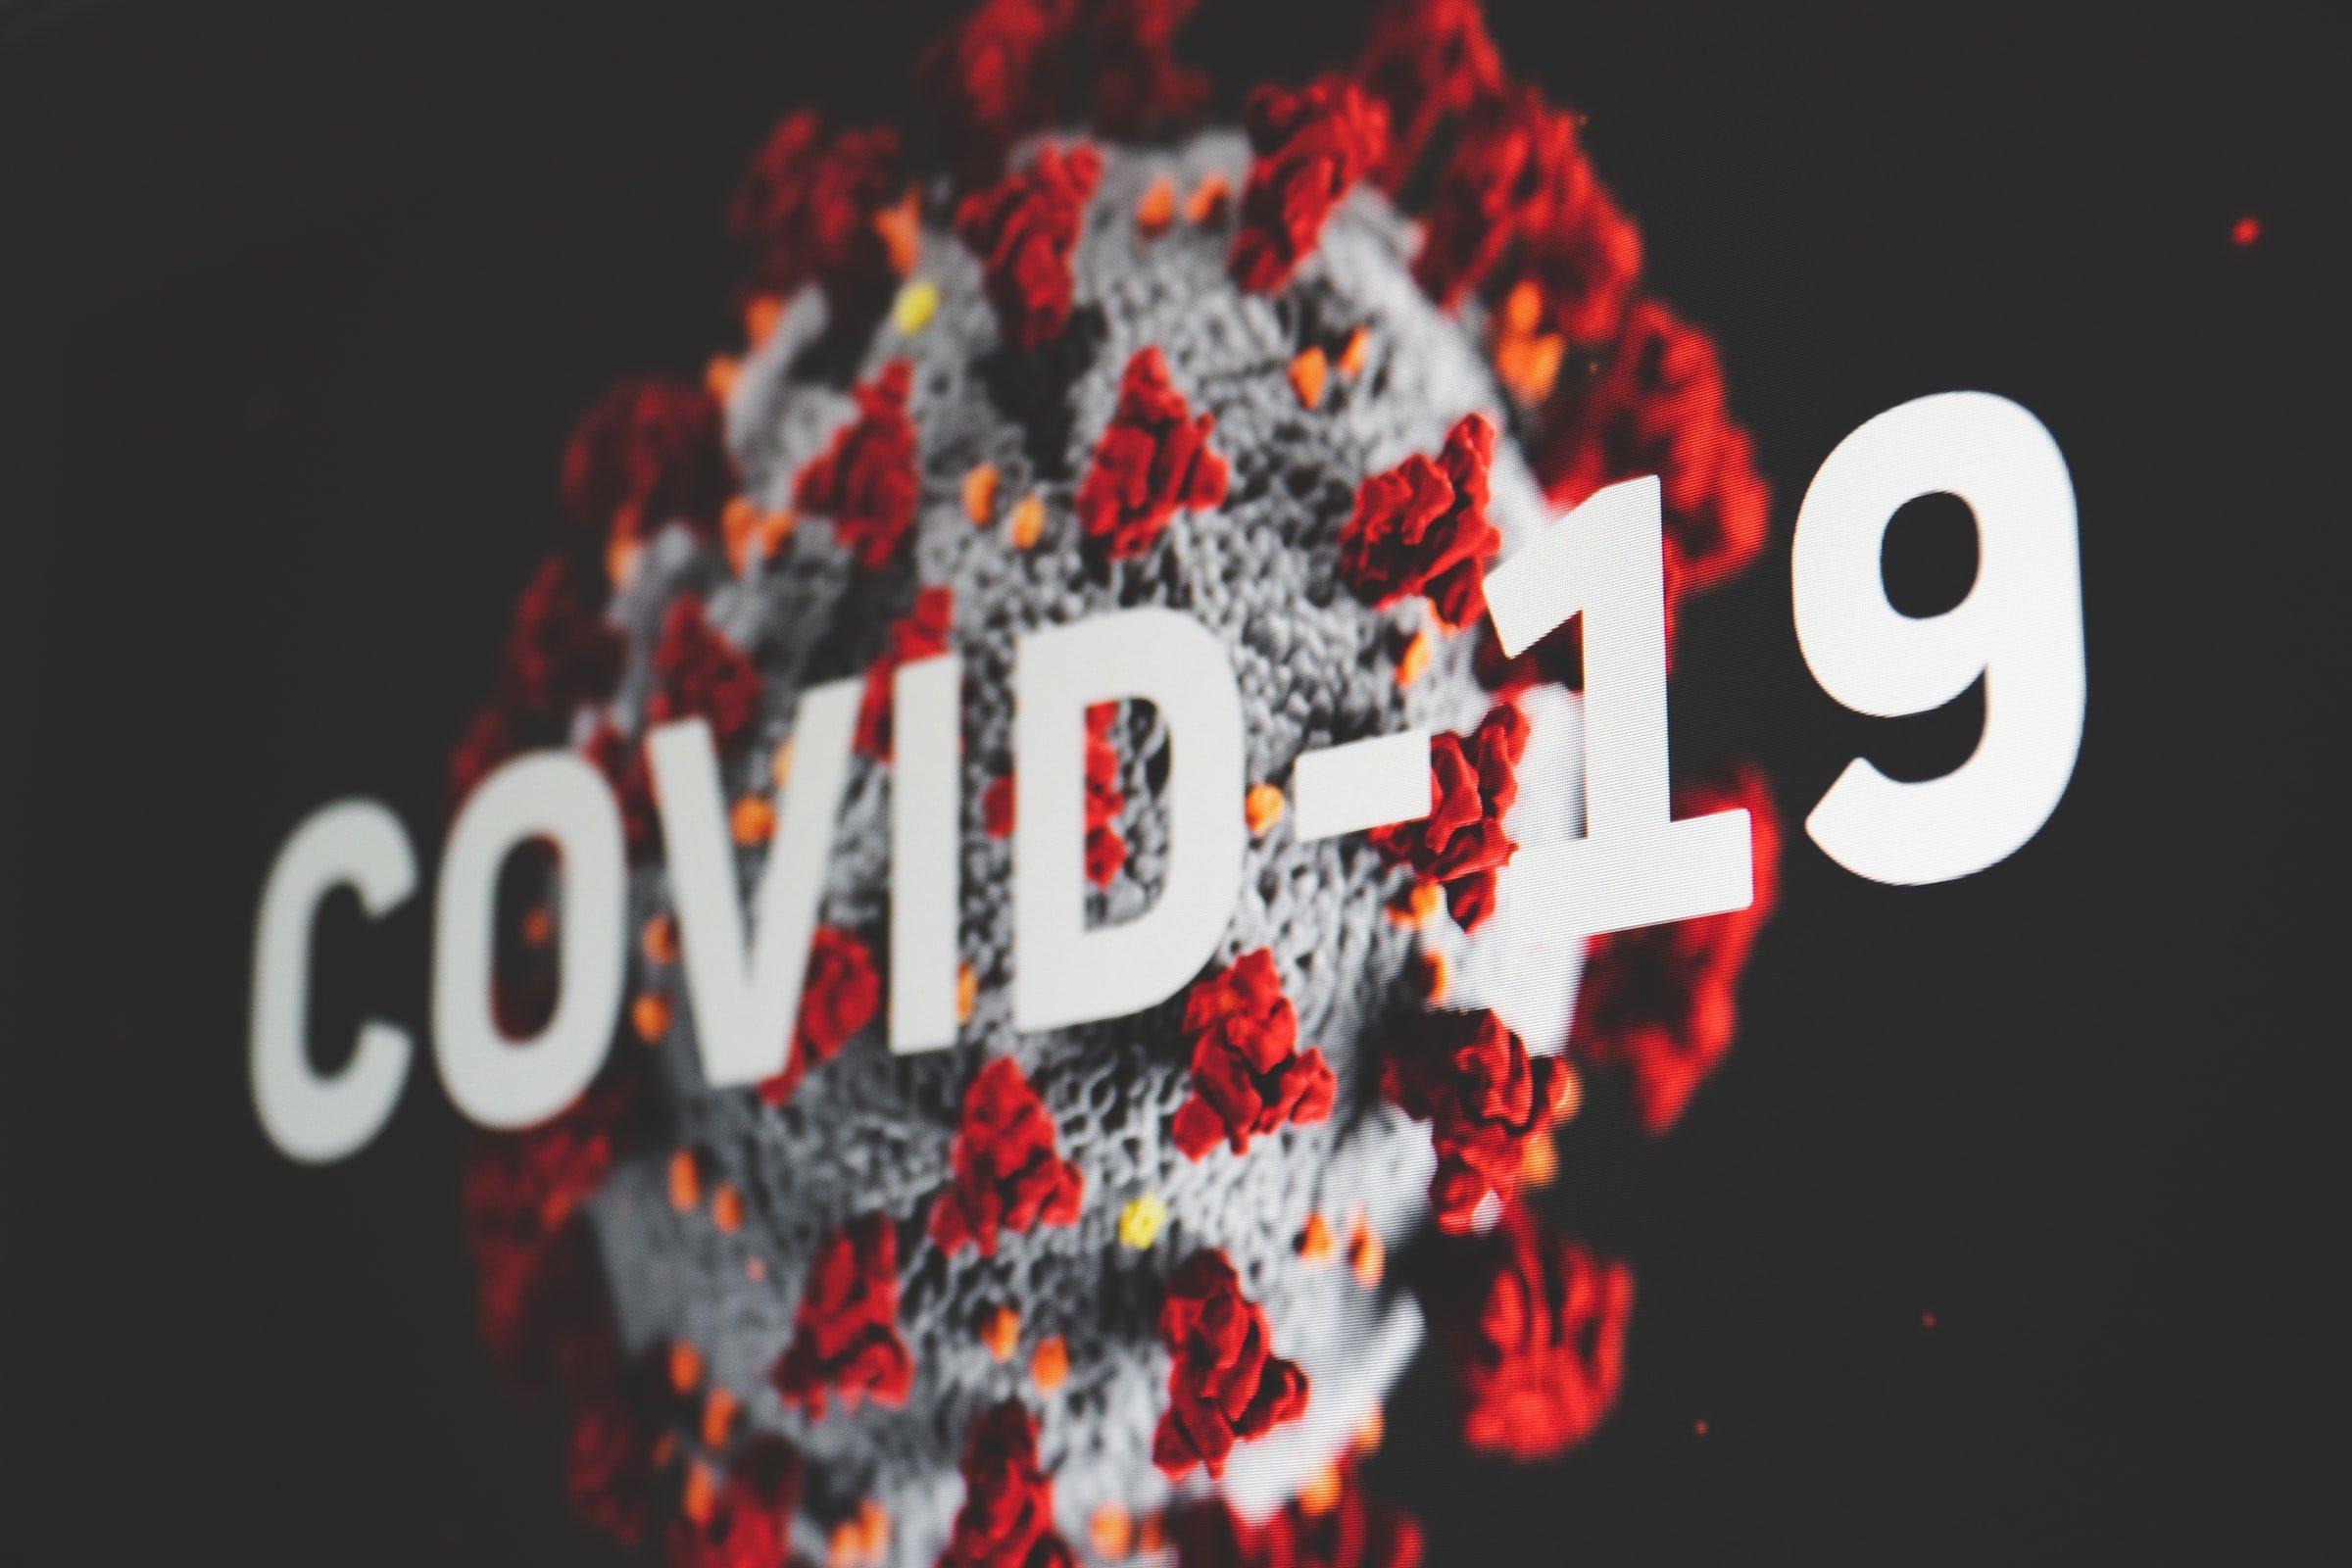 Ivermectin prices soar on Amazon despite FDA warning of false COVID-19 cure